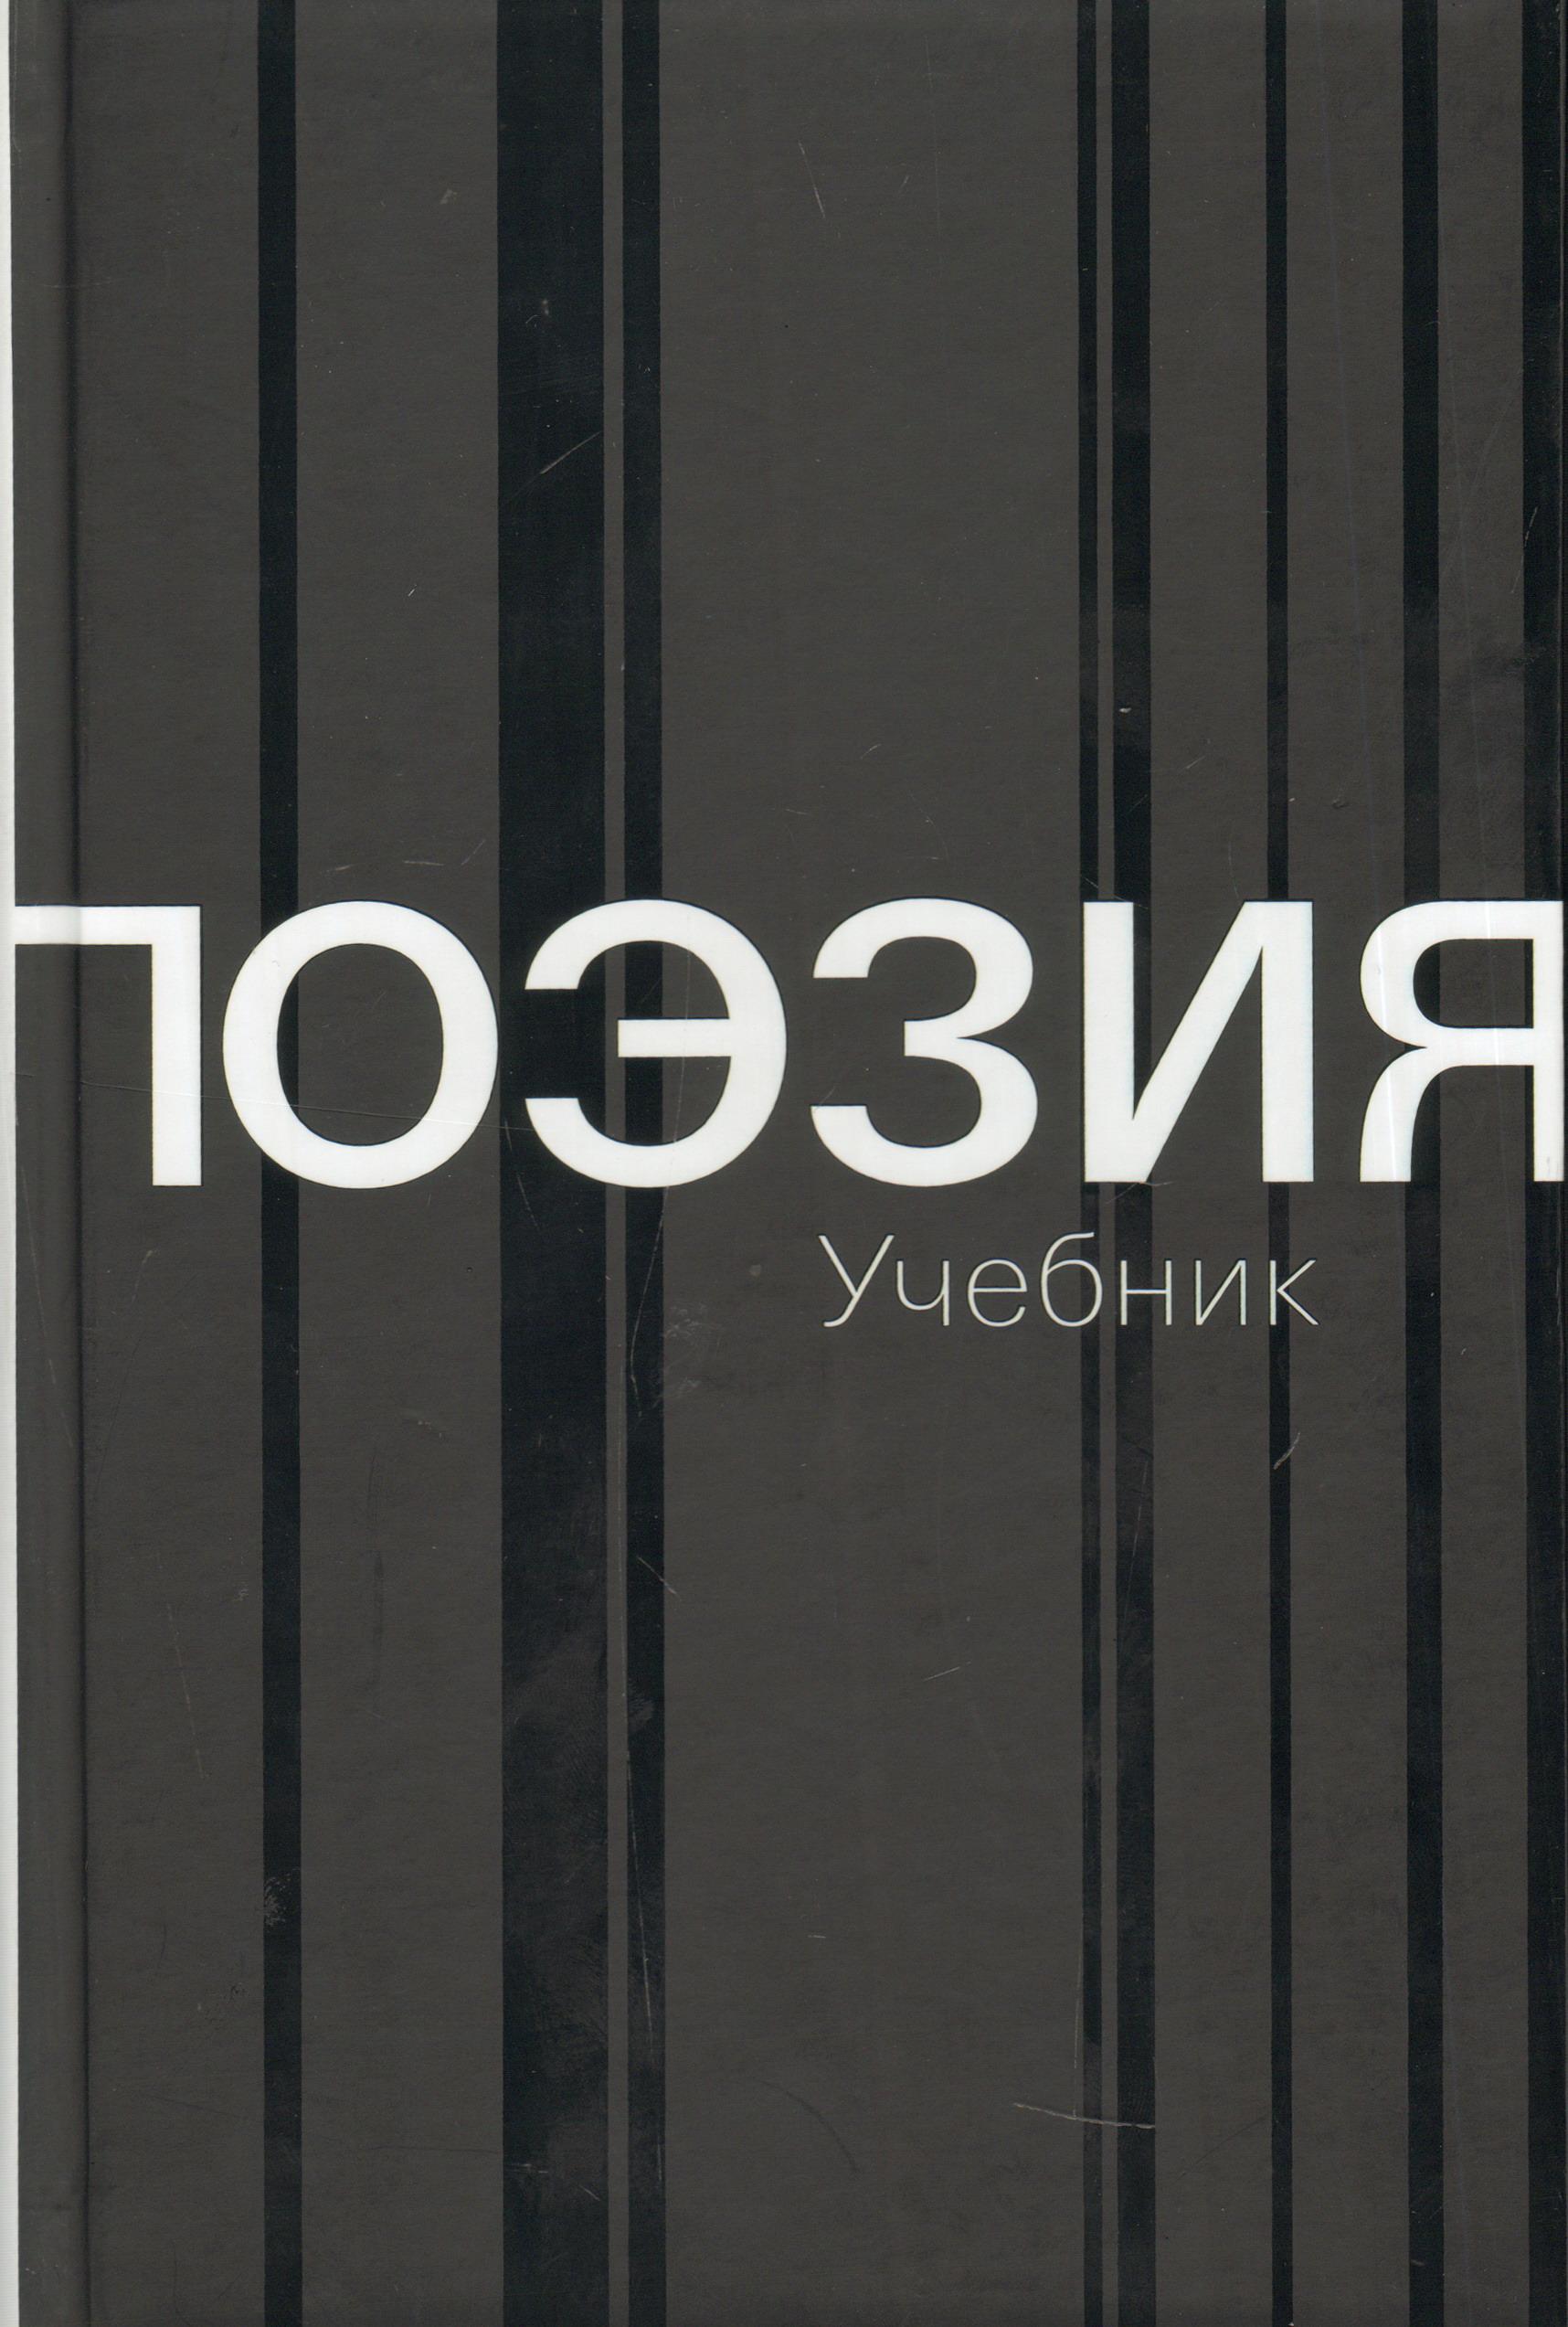 10 Ankudinov poesia3